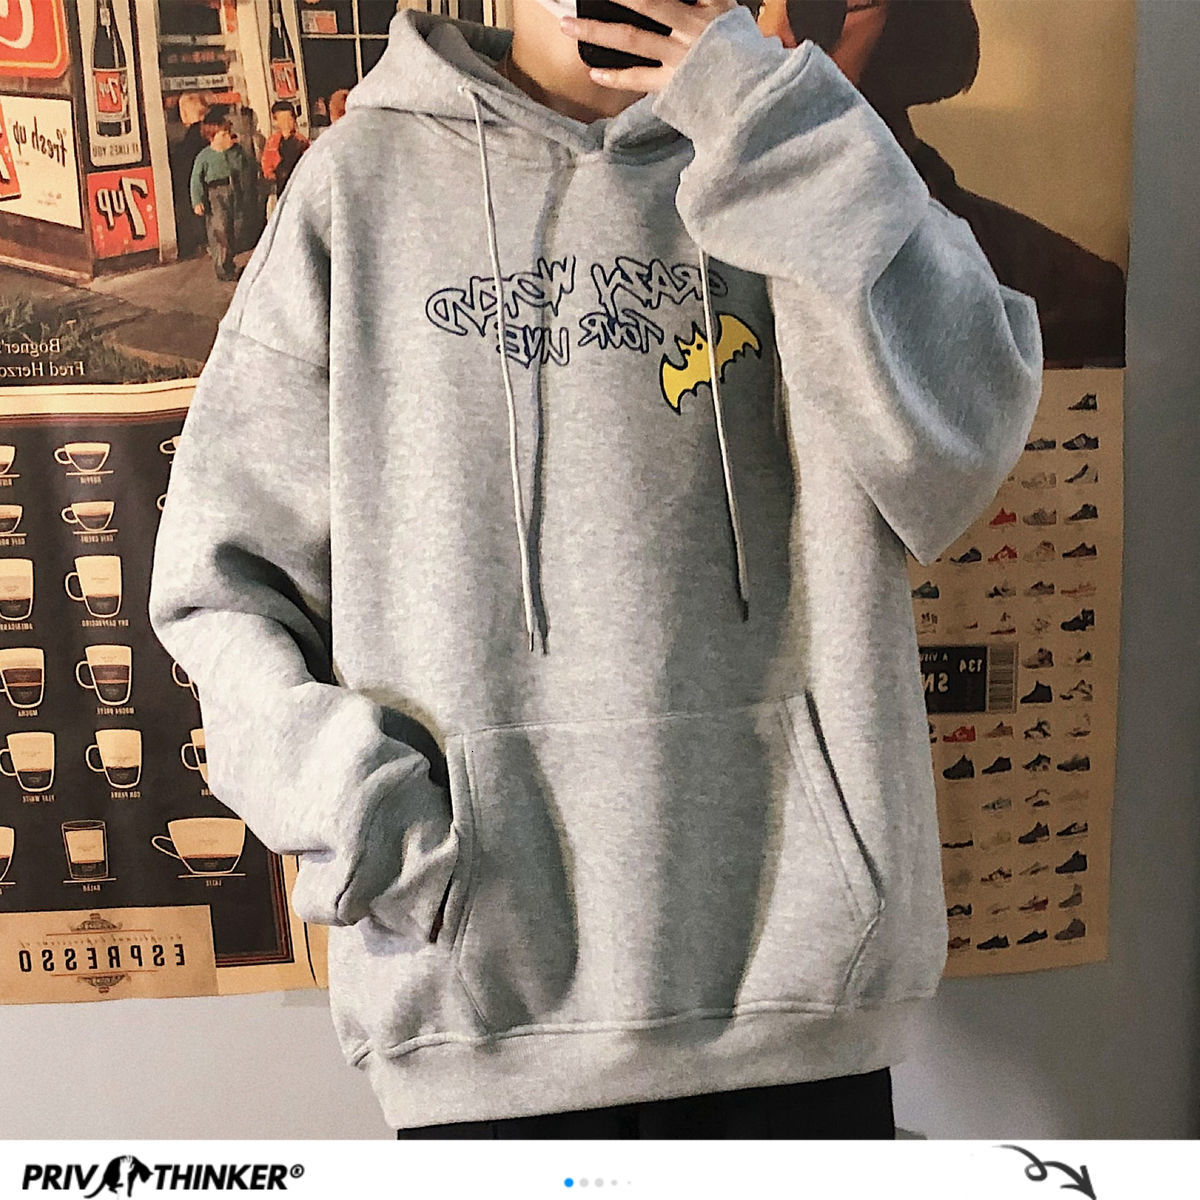 Privathinker Funny Printed Men's Fleece Hoodies Japanese Men Women Oversized Sweatshirts 2020 Autumn Warm Hooded Pullovers